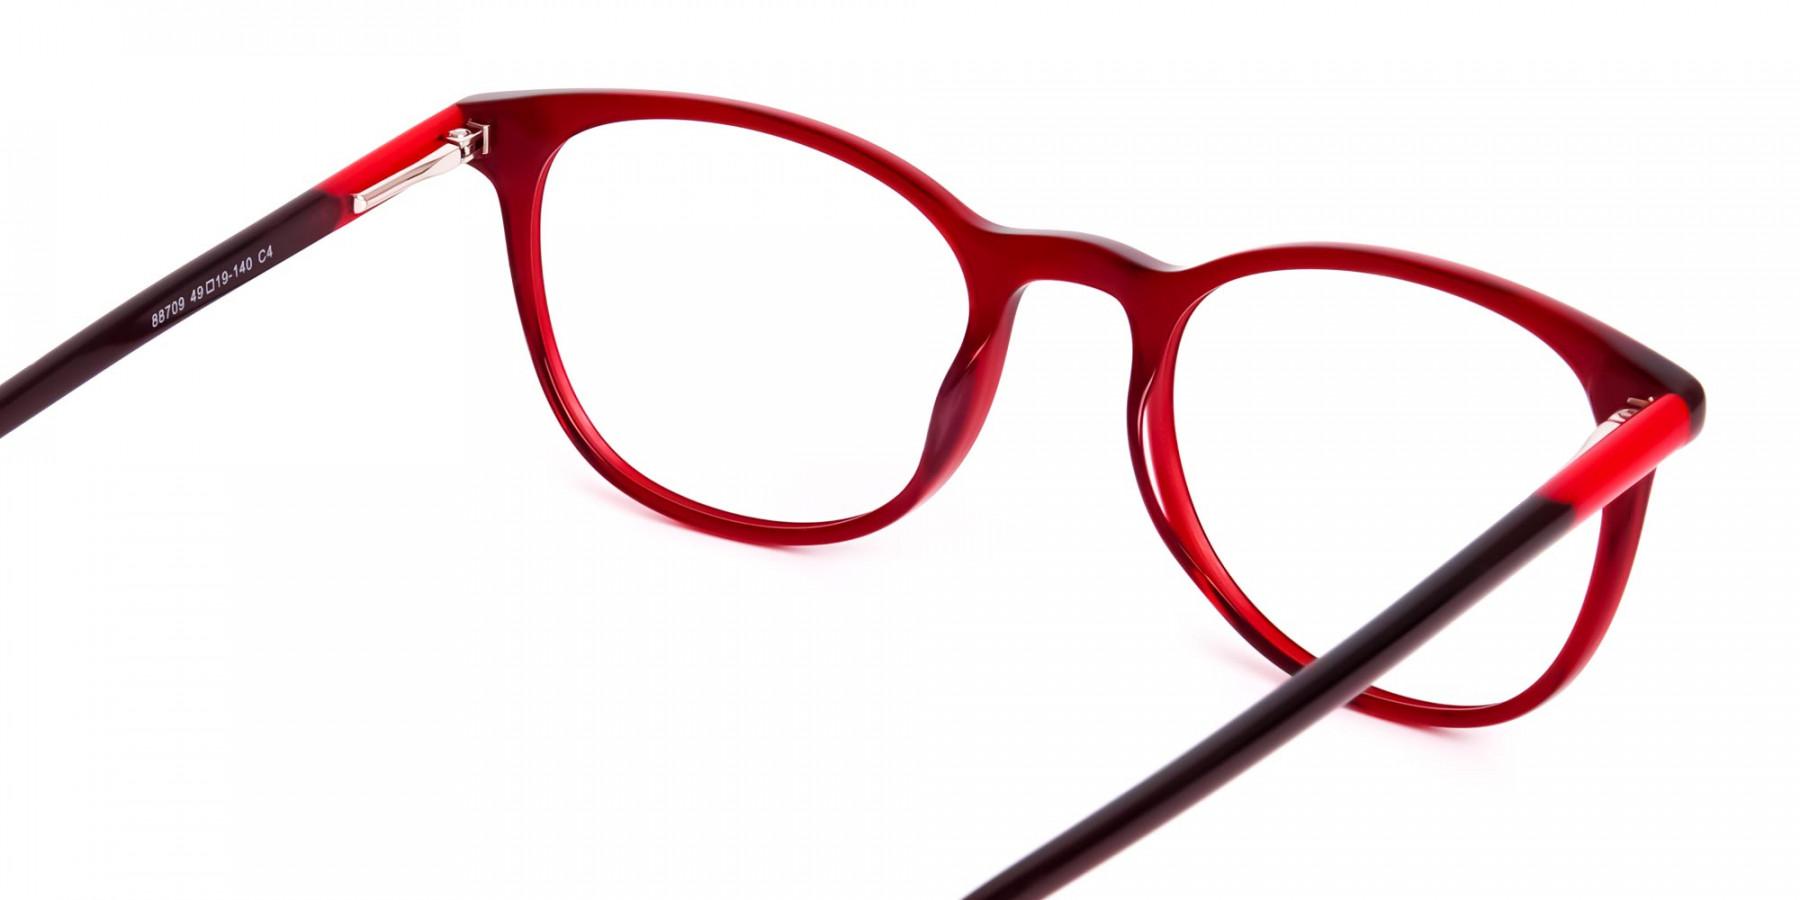 Wine-Red-Translucent-Round-Glasses-Frames-1